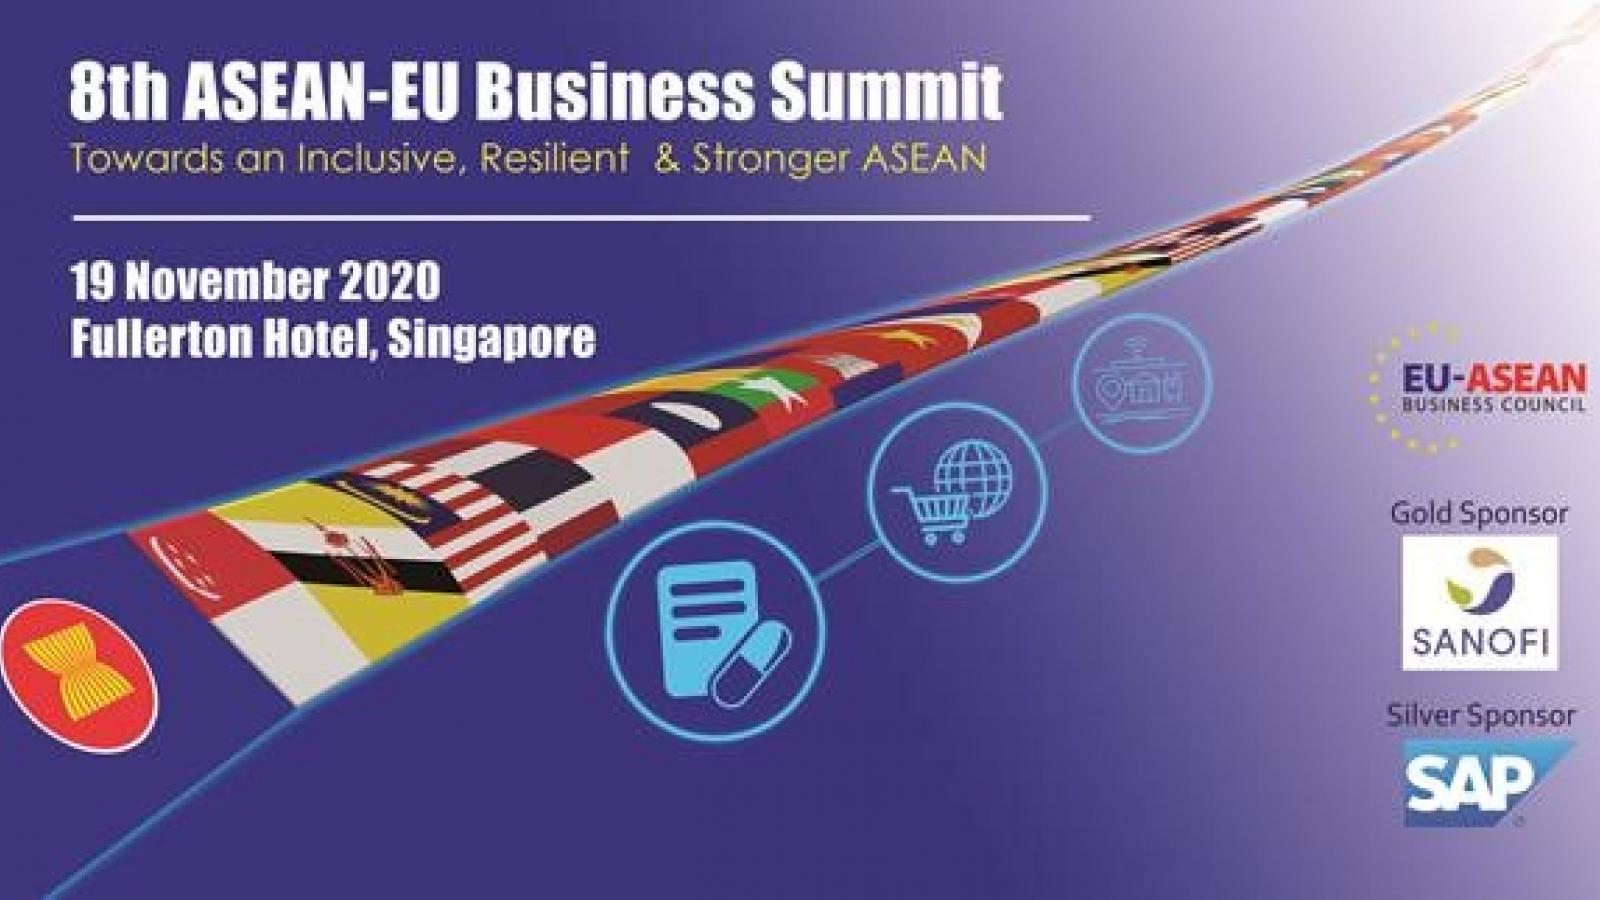 Vietnam underscores importance of FTAs to ASEAN-EU relations